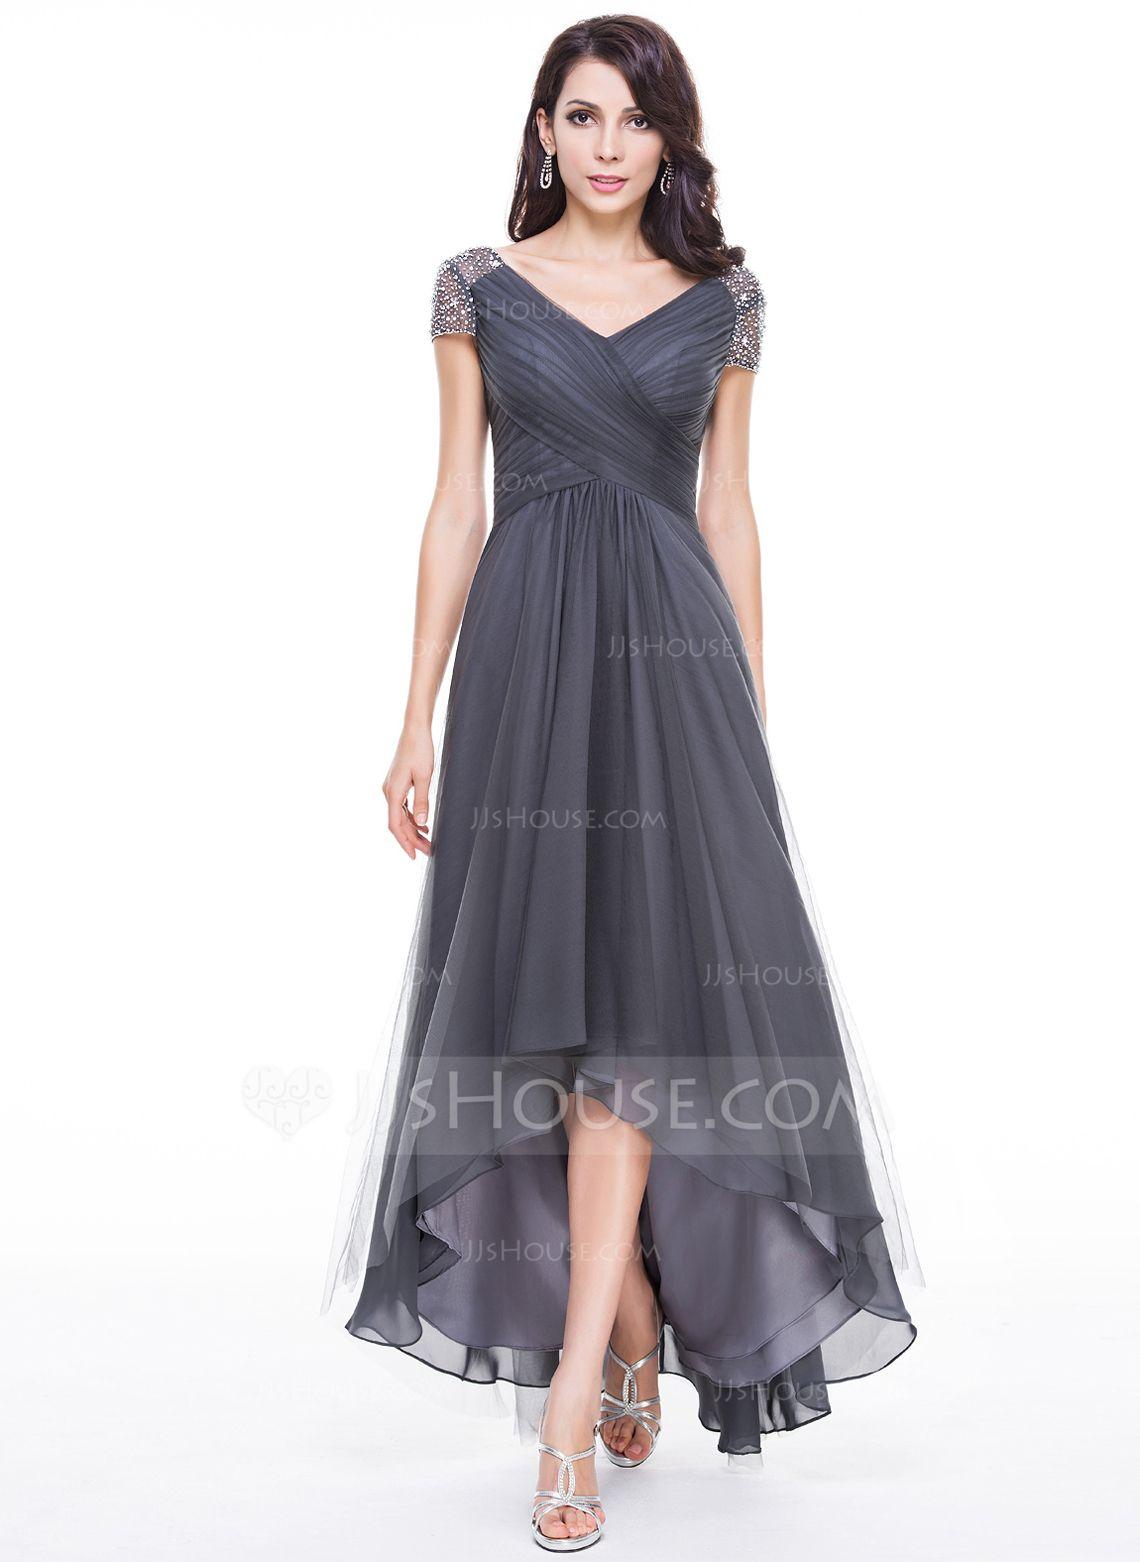 b9db09c1c532 A-Line/Princess V-neck Asymmetrical Tulle Evening Dress With Ruffle Beading  Sequins (017056519) - JJsHouse